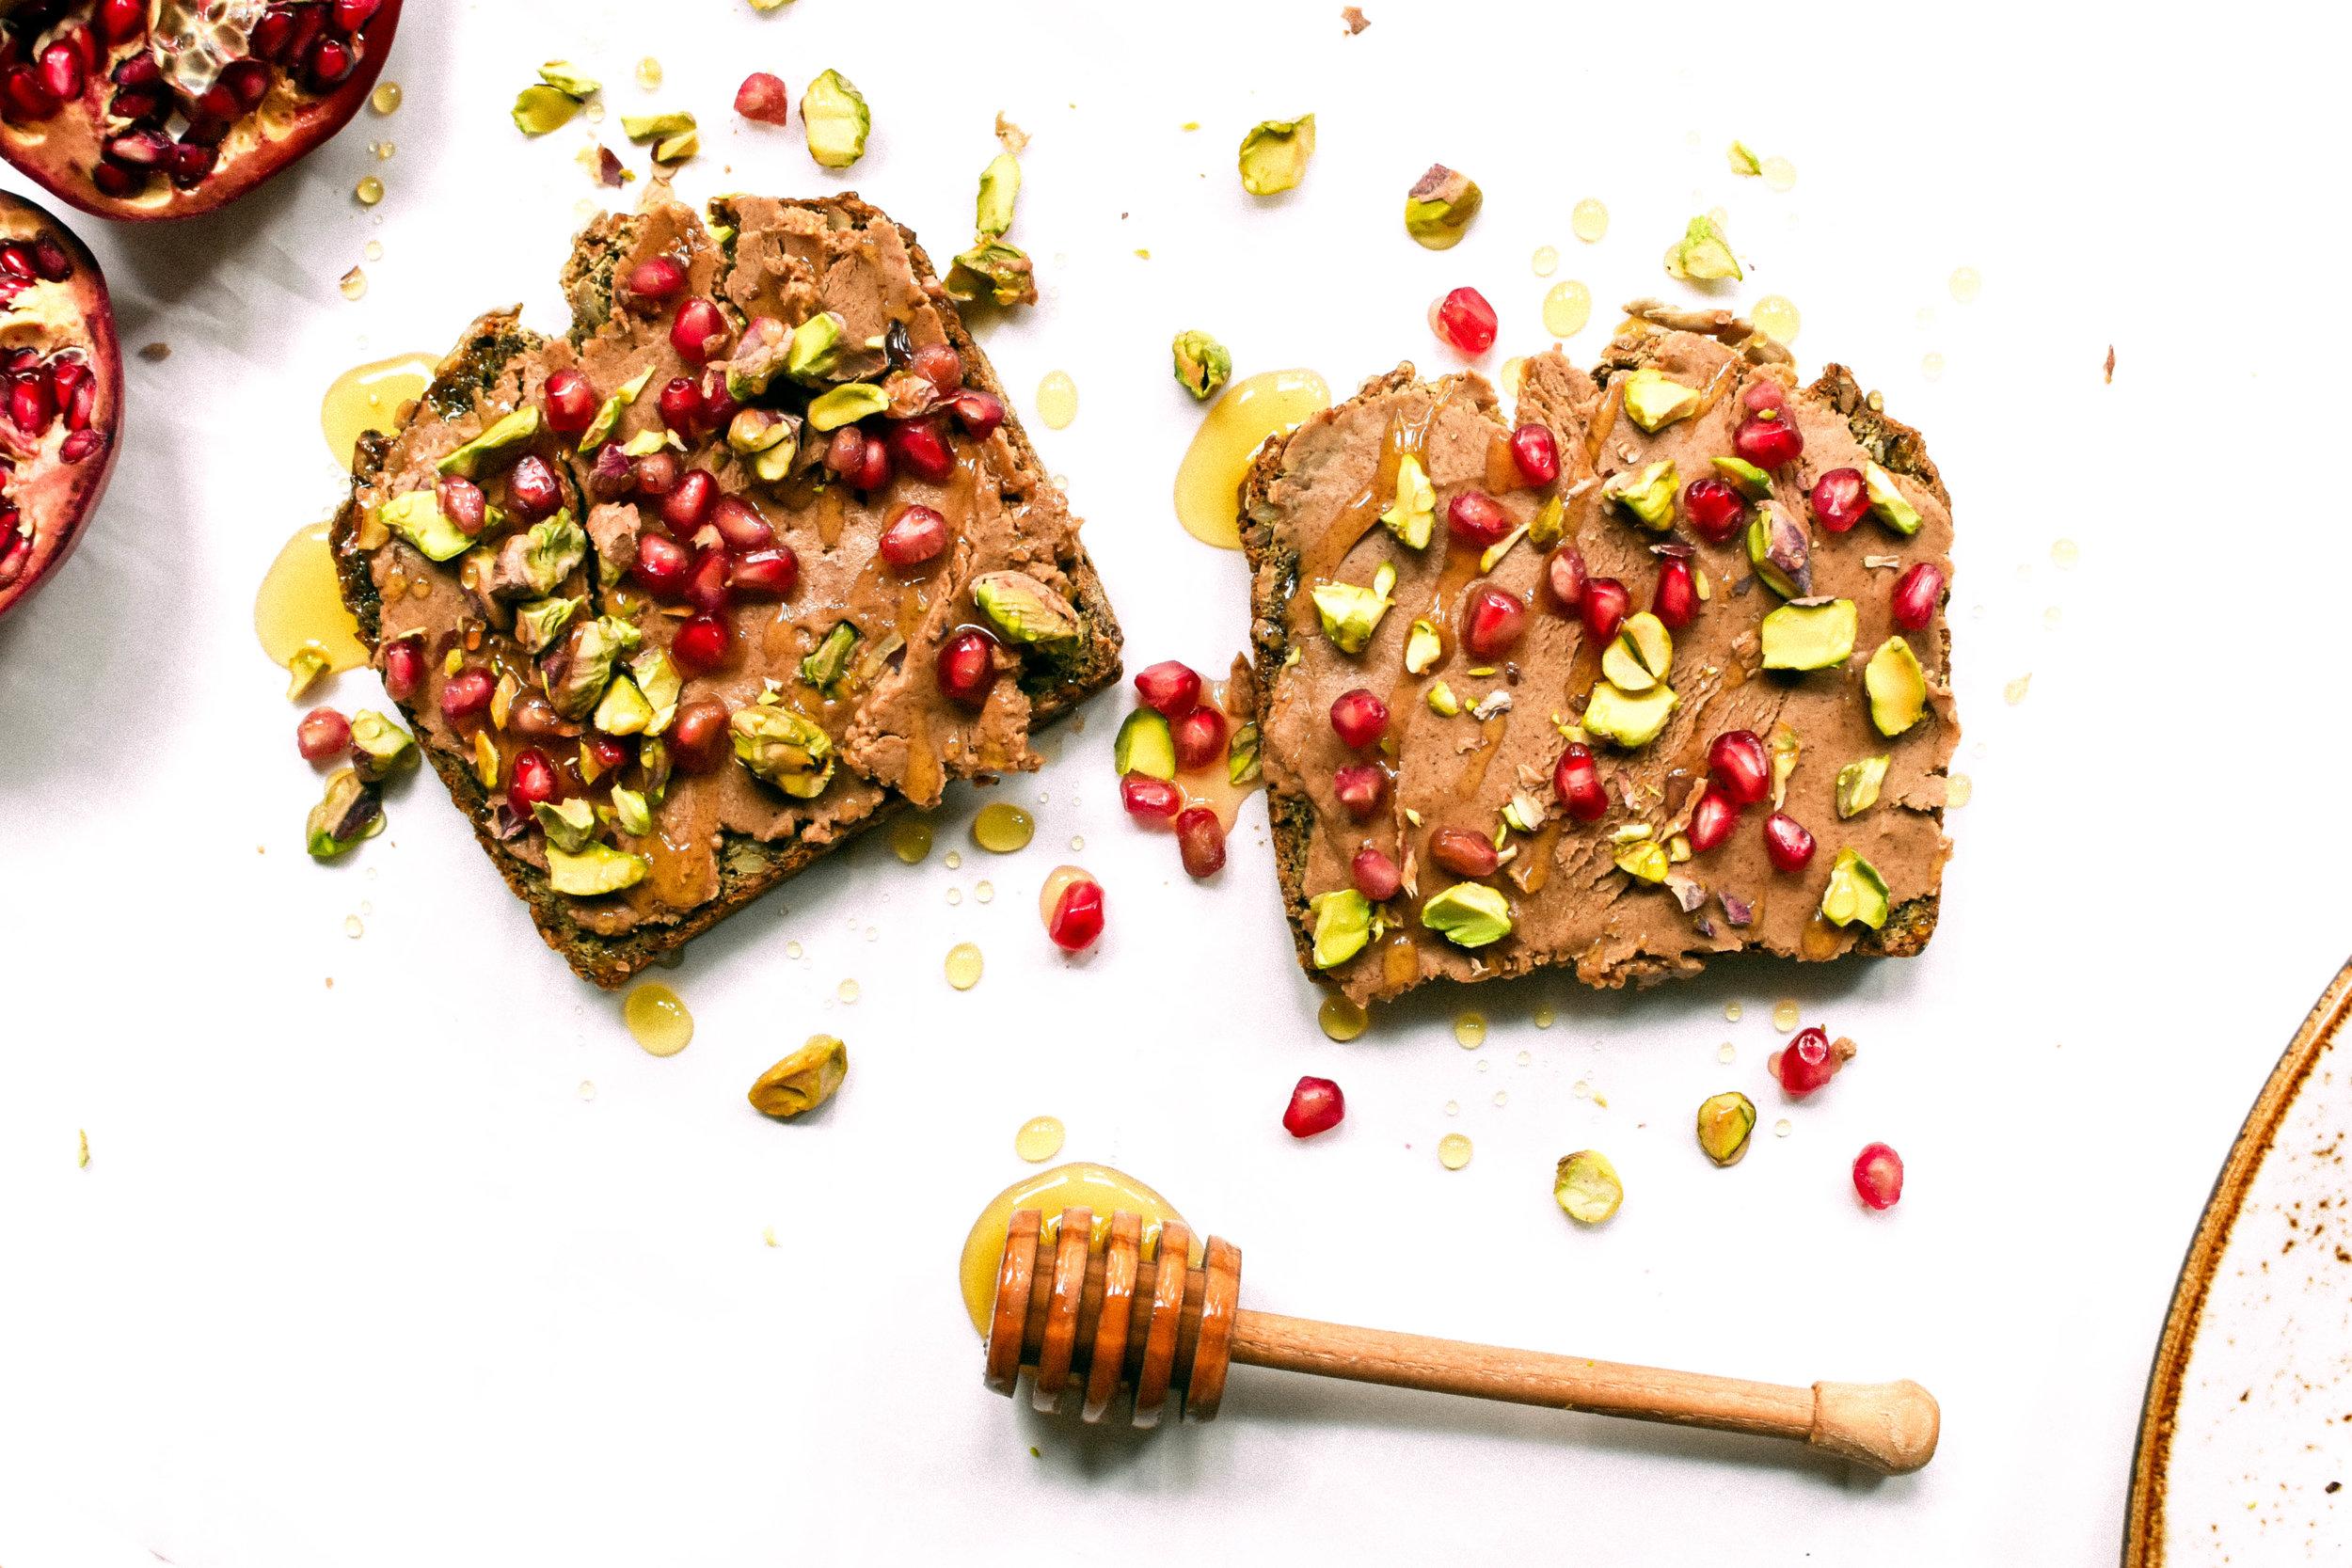 Pomegranate and Pistachio Breakfast Toast